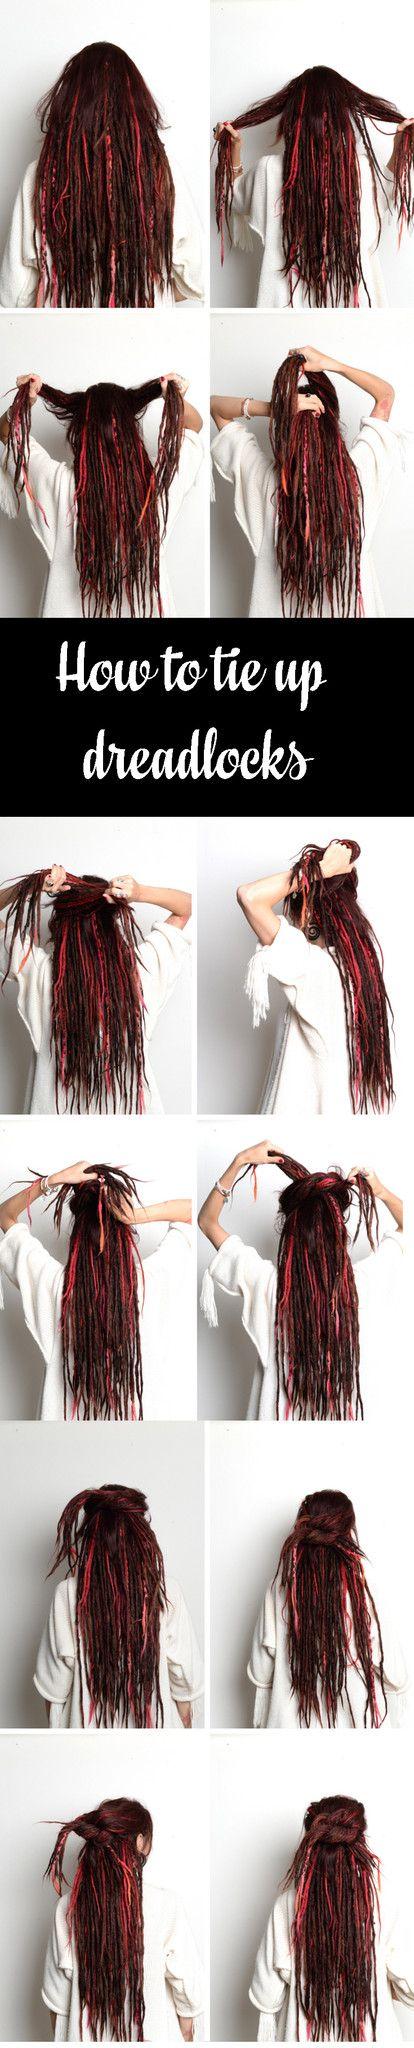 How To Tie Up Dreadlocks Hair Styles Dreadlock Hairstyles Dreadlocks